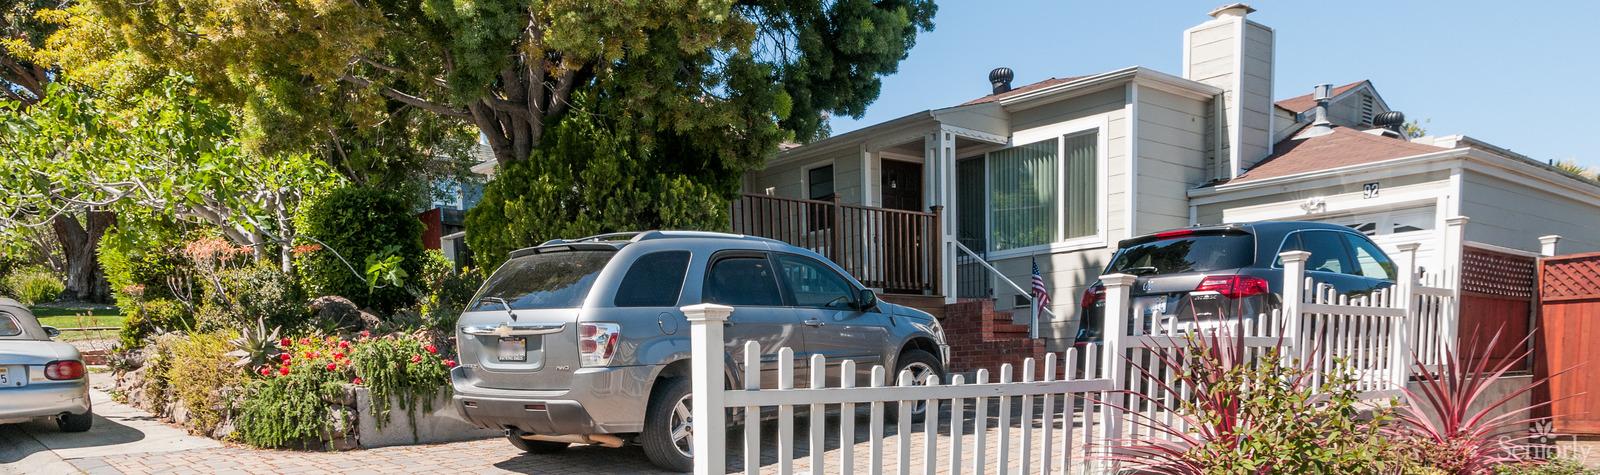 B&B Residential Facilities (92 W) San Mateo CA 4